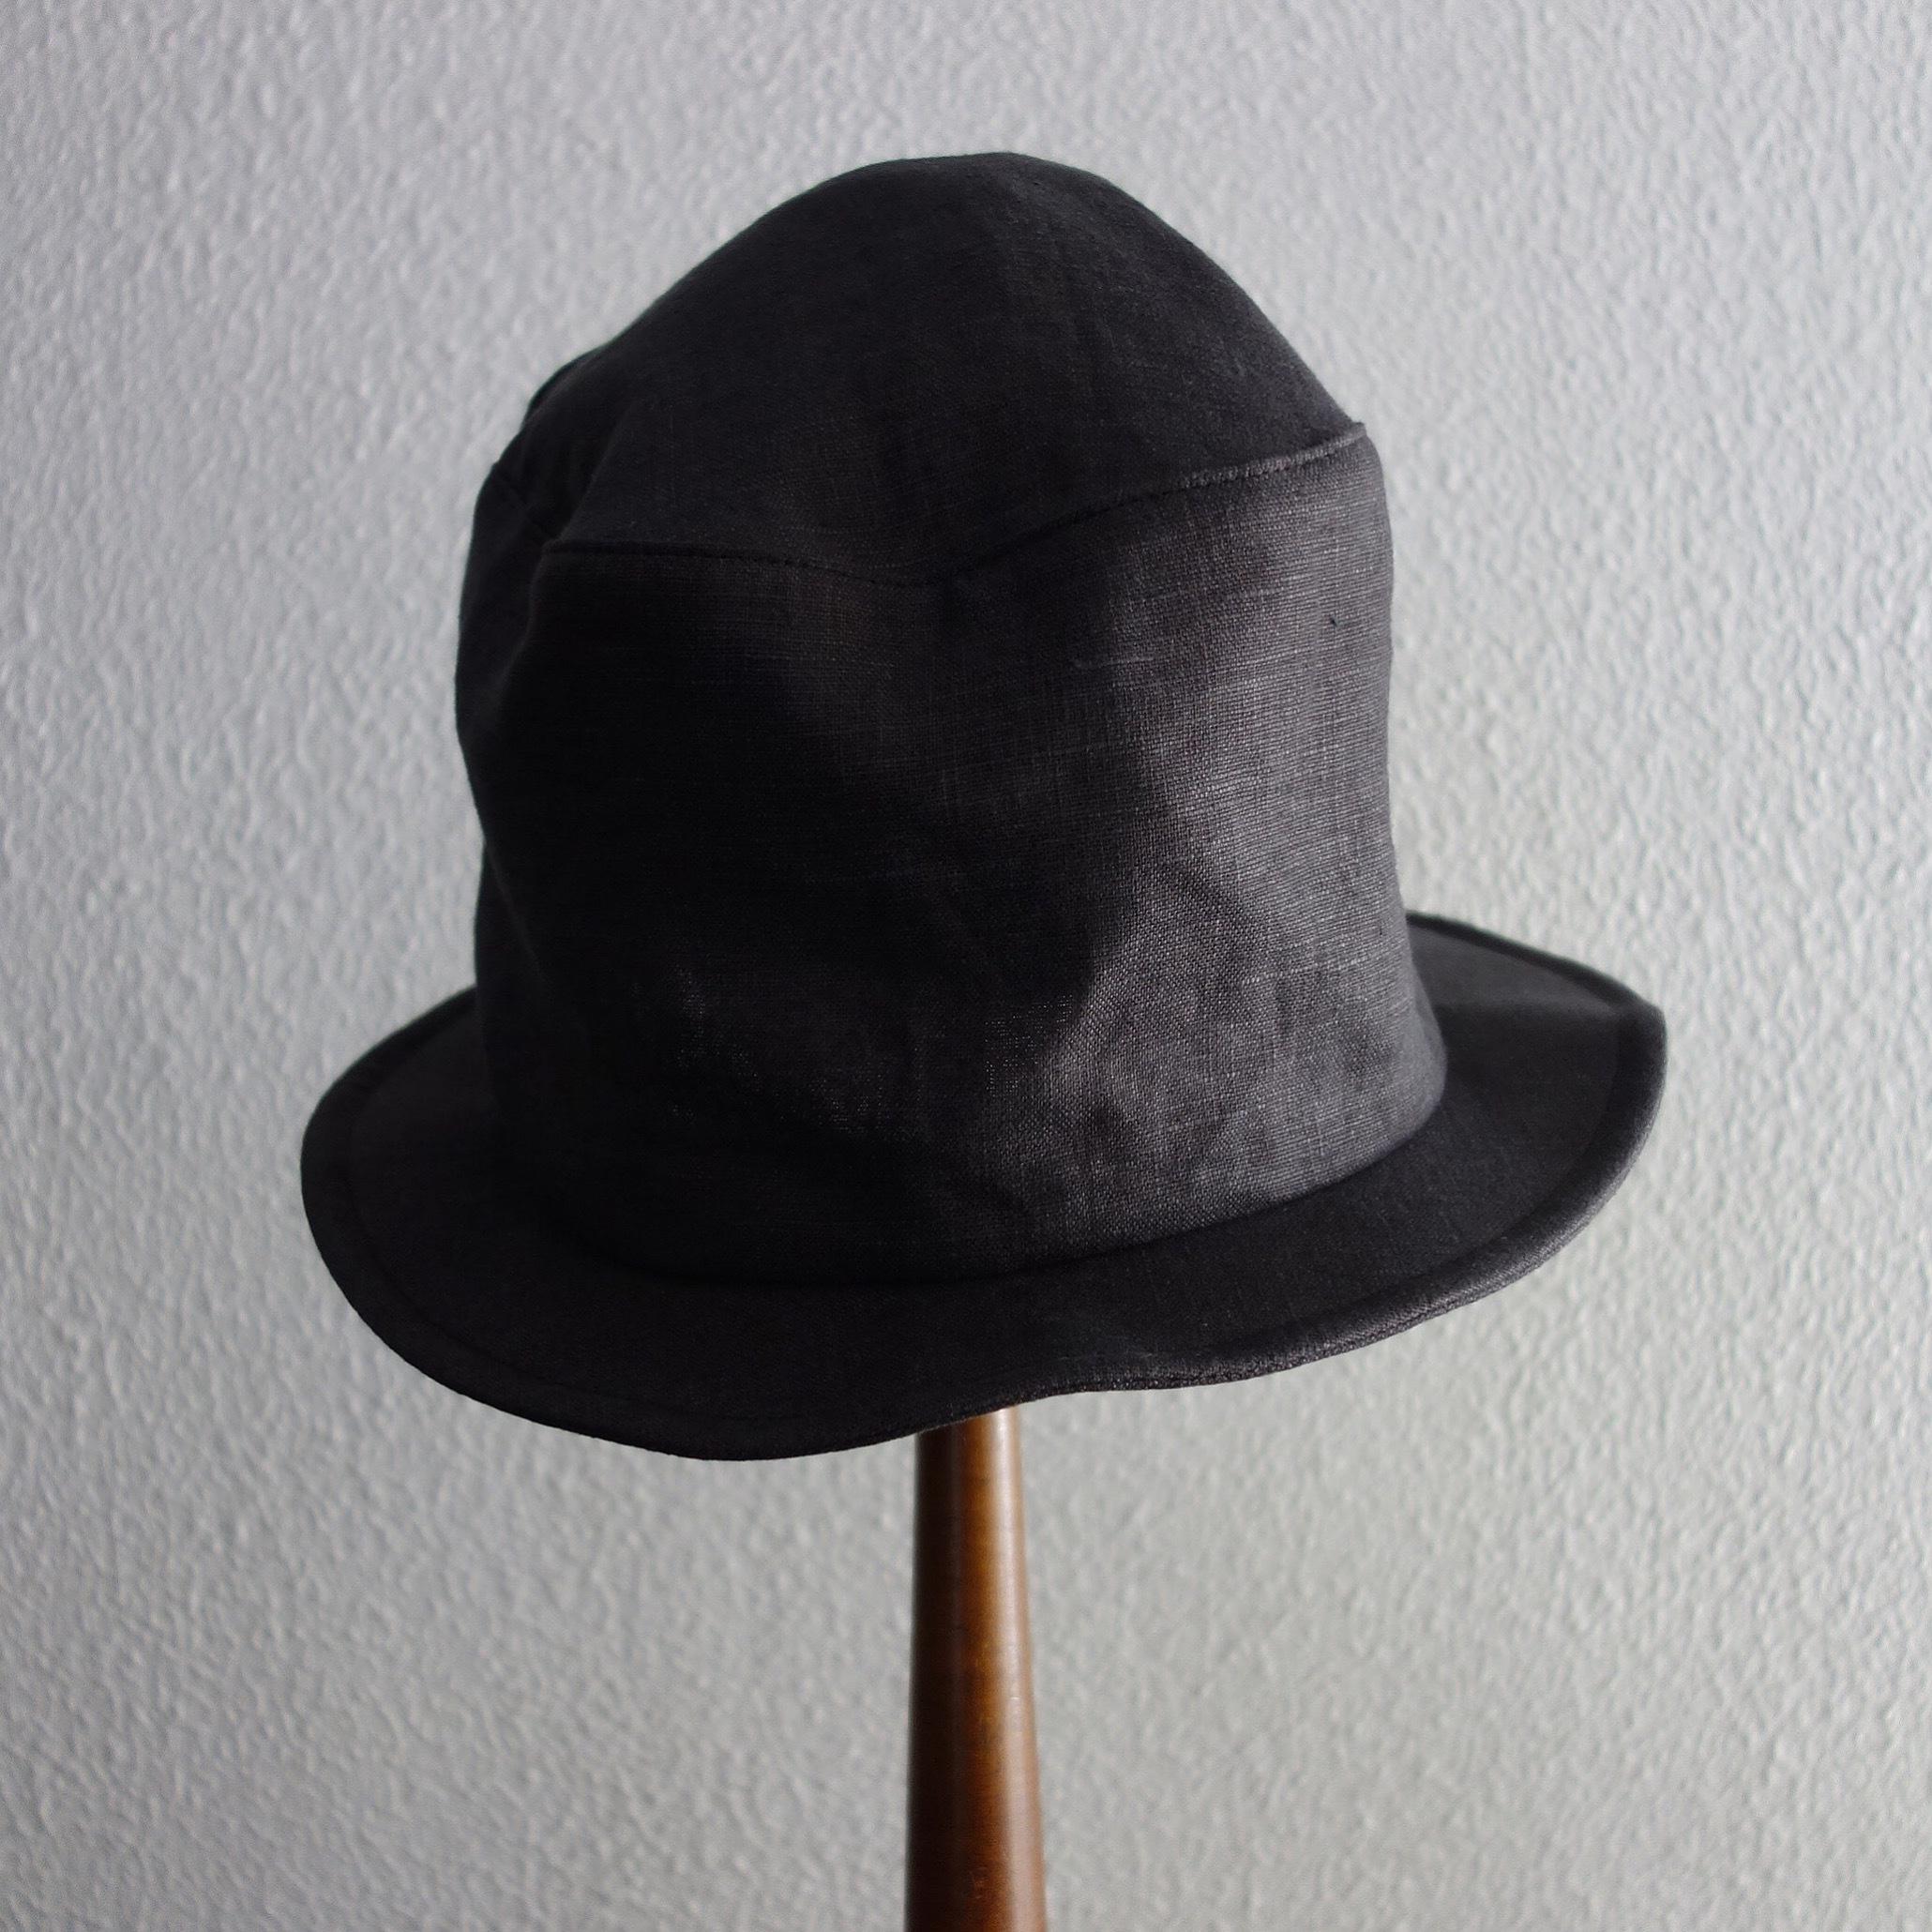 chevalier hat Ⅱ / antique charcoal